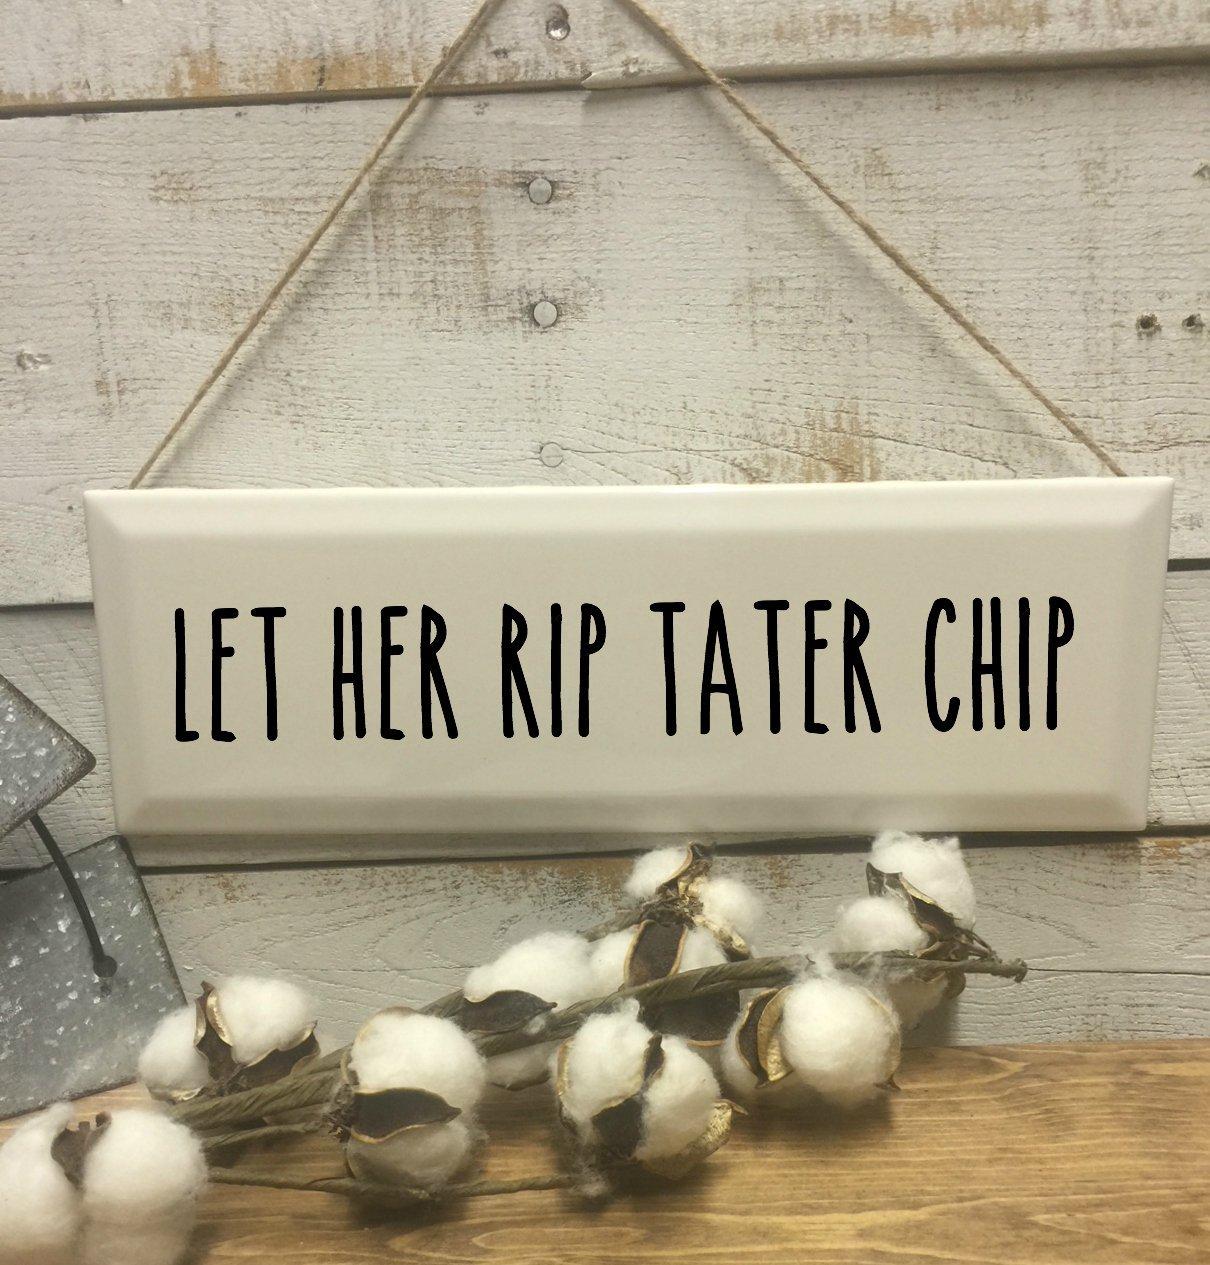 Let Her Rip Tater Chip Sign-Wall Decor-Bathroom Sign-Rae Dunn-Bathroom Art